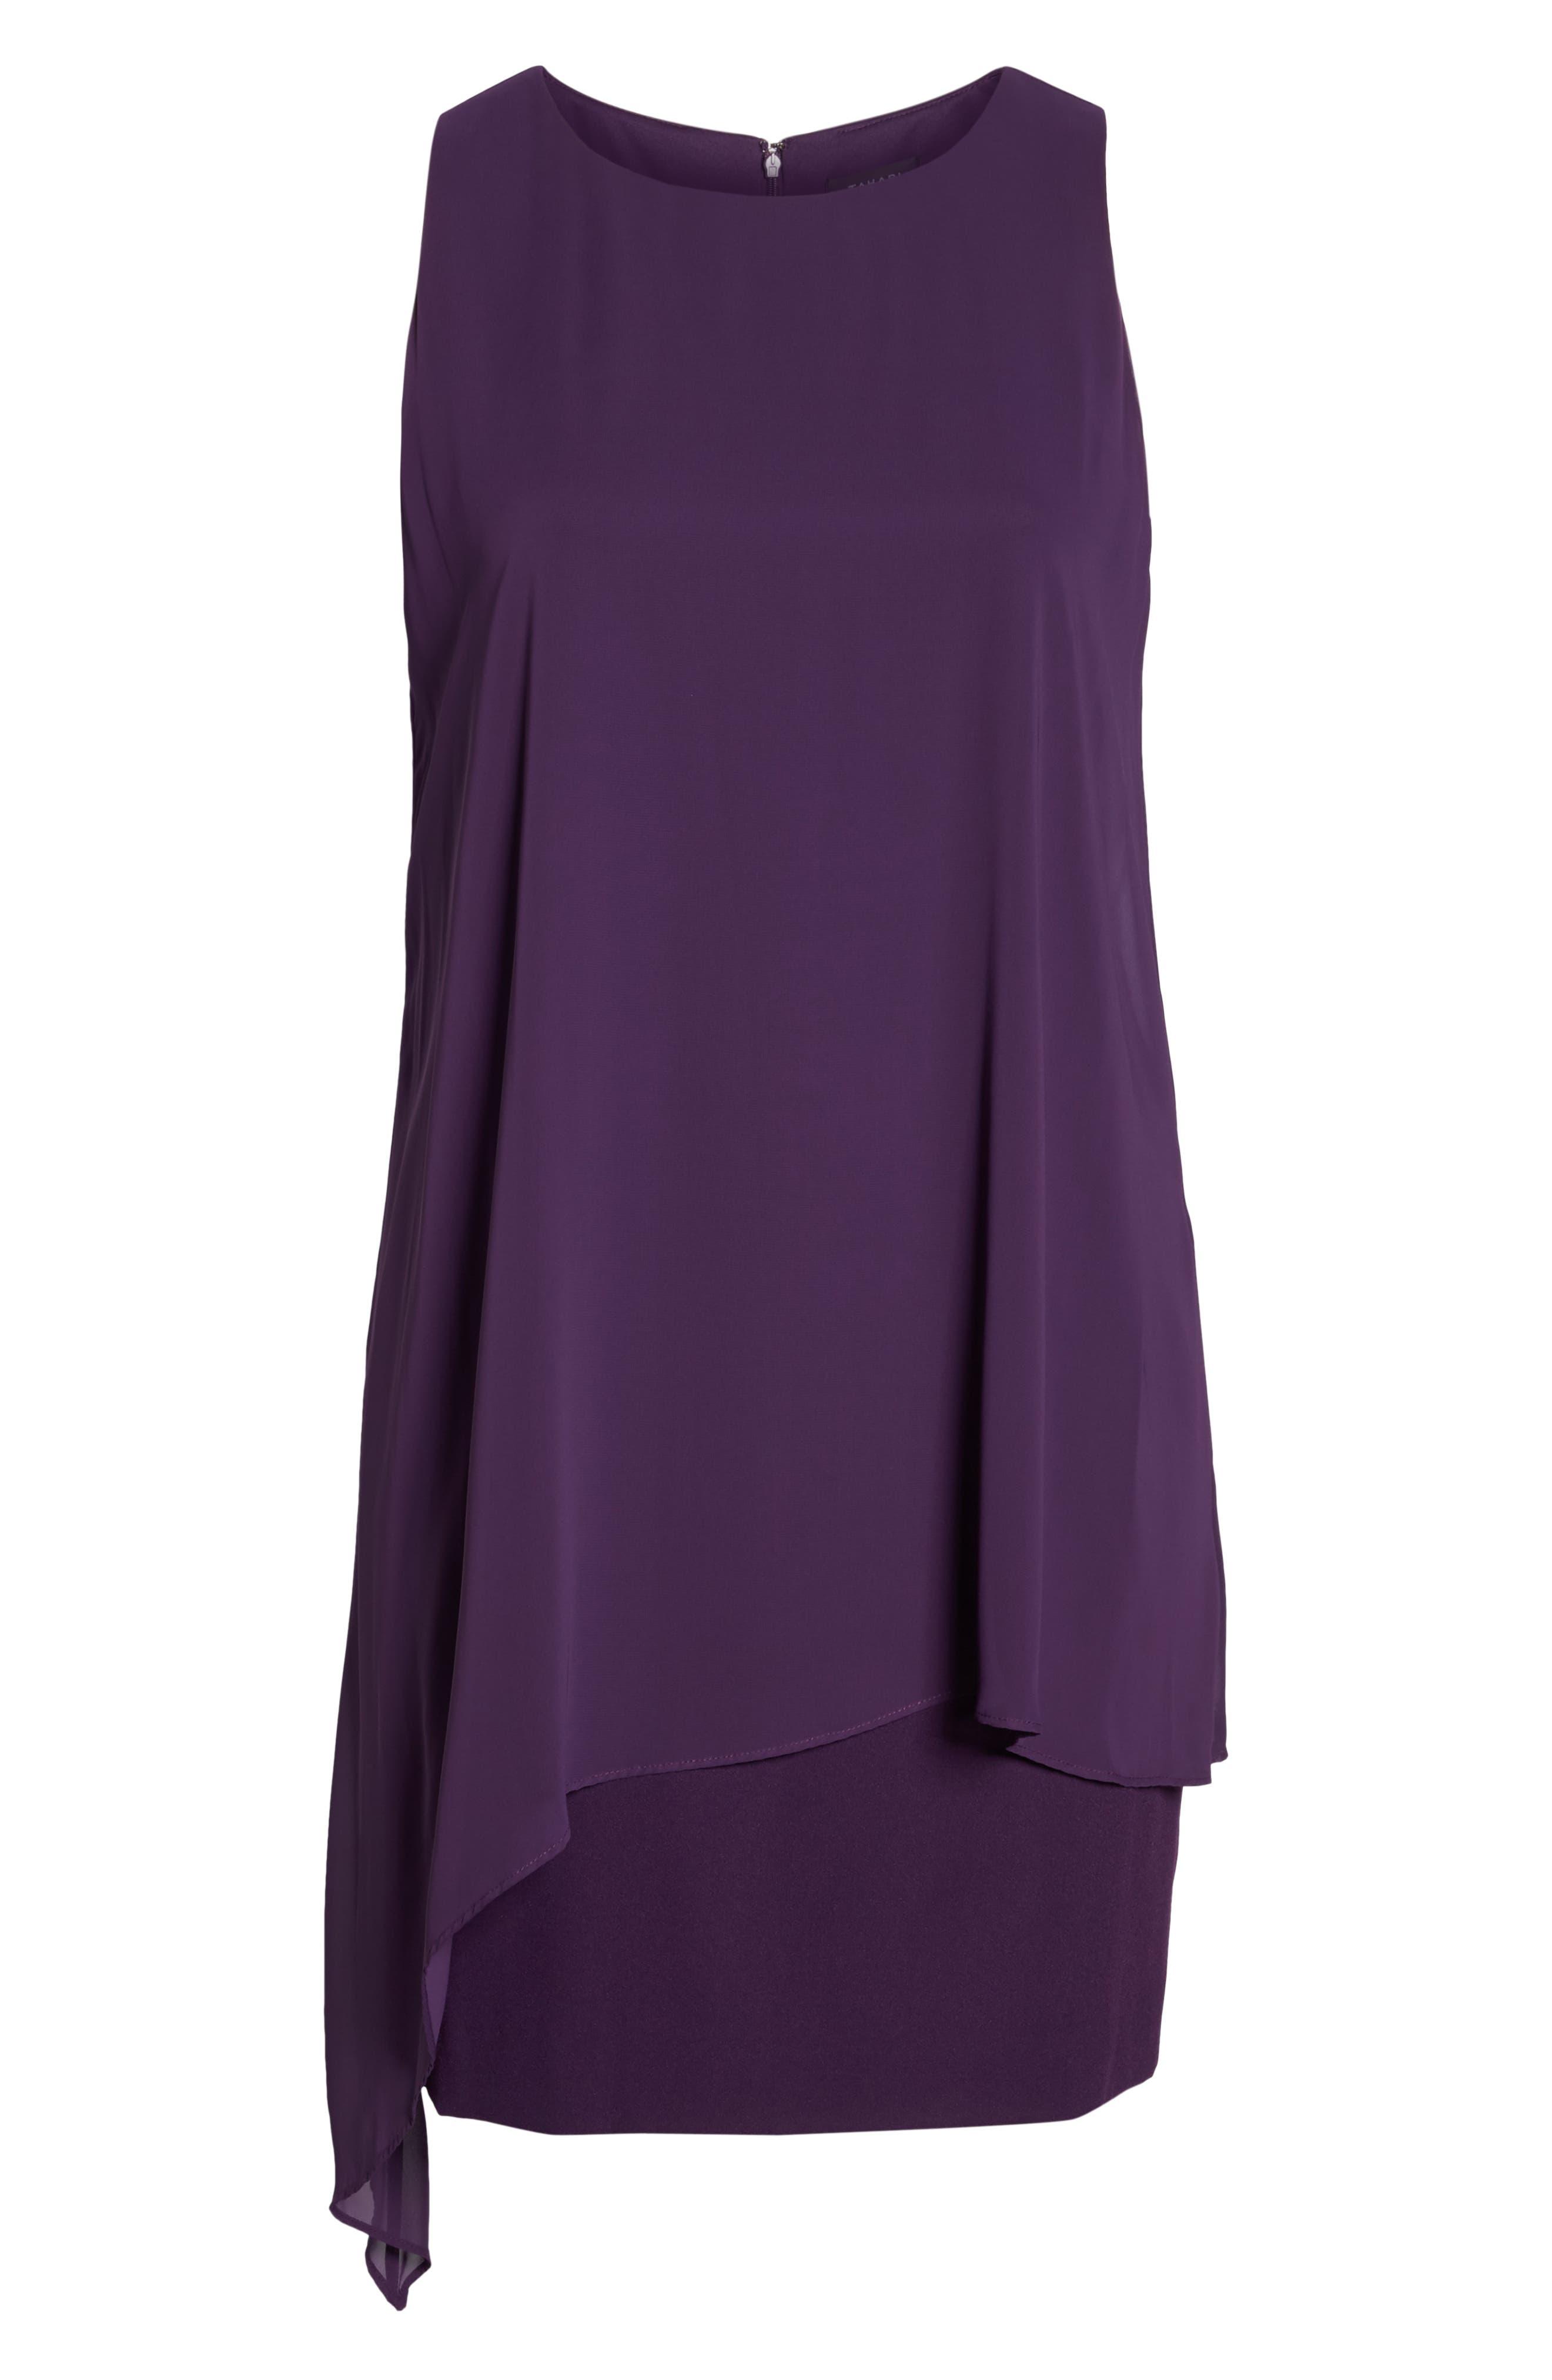 Chiffon Overlay Sheath Dress,                             Alternate thumbnail 7, color,                             PLUM